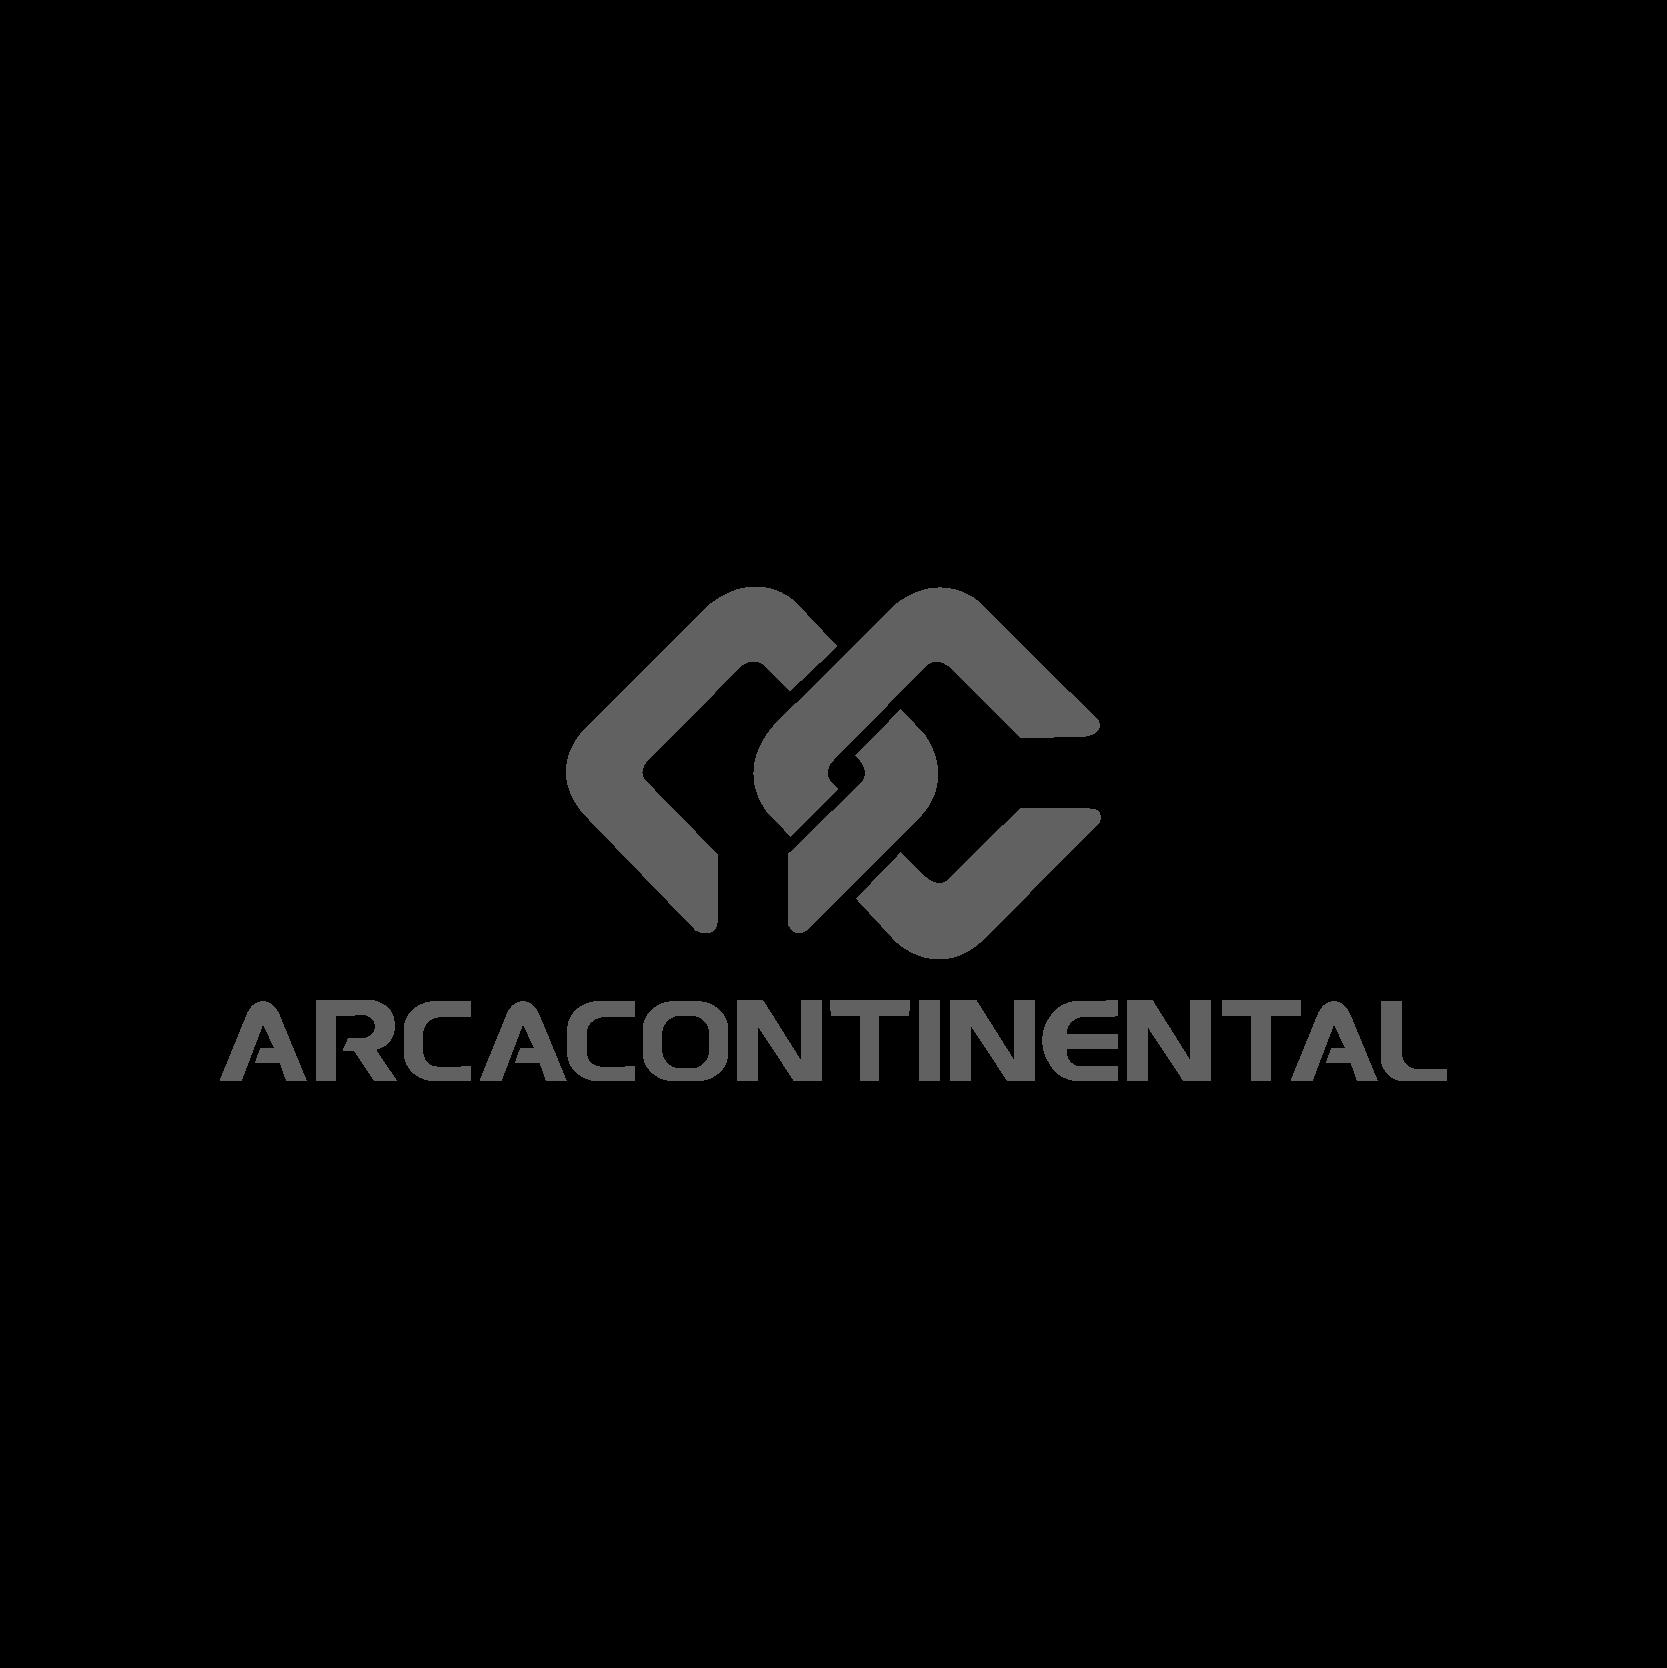 Arcacontinental